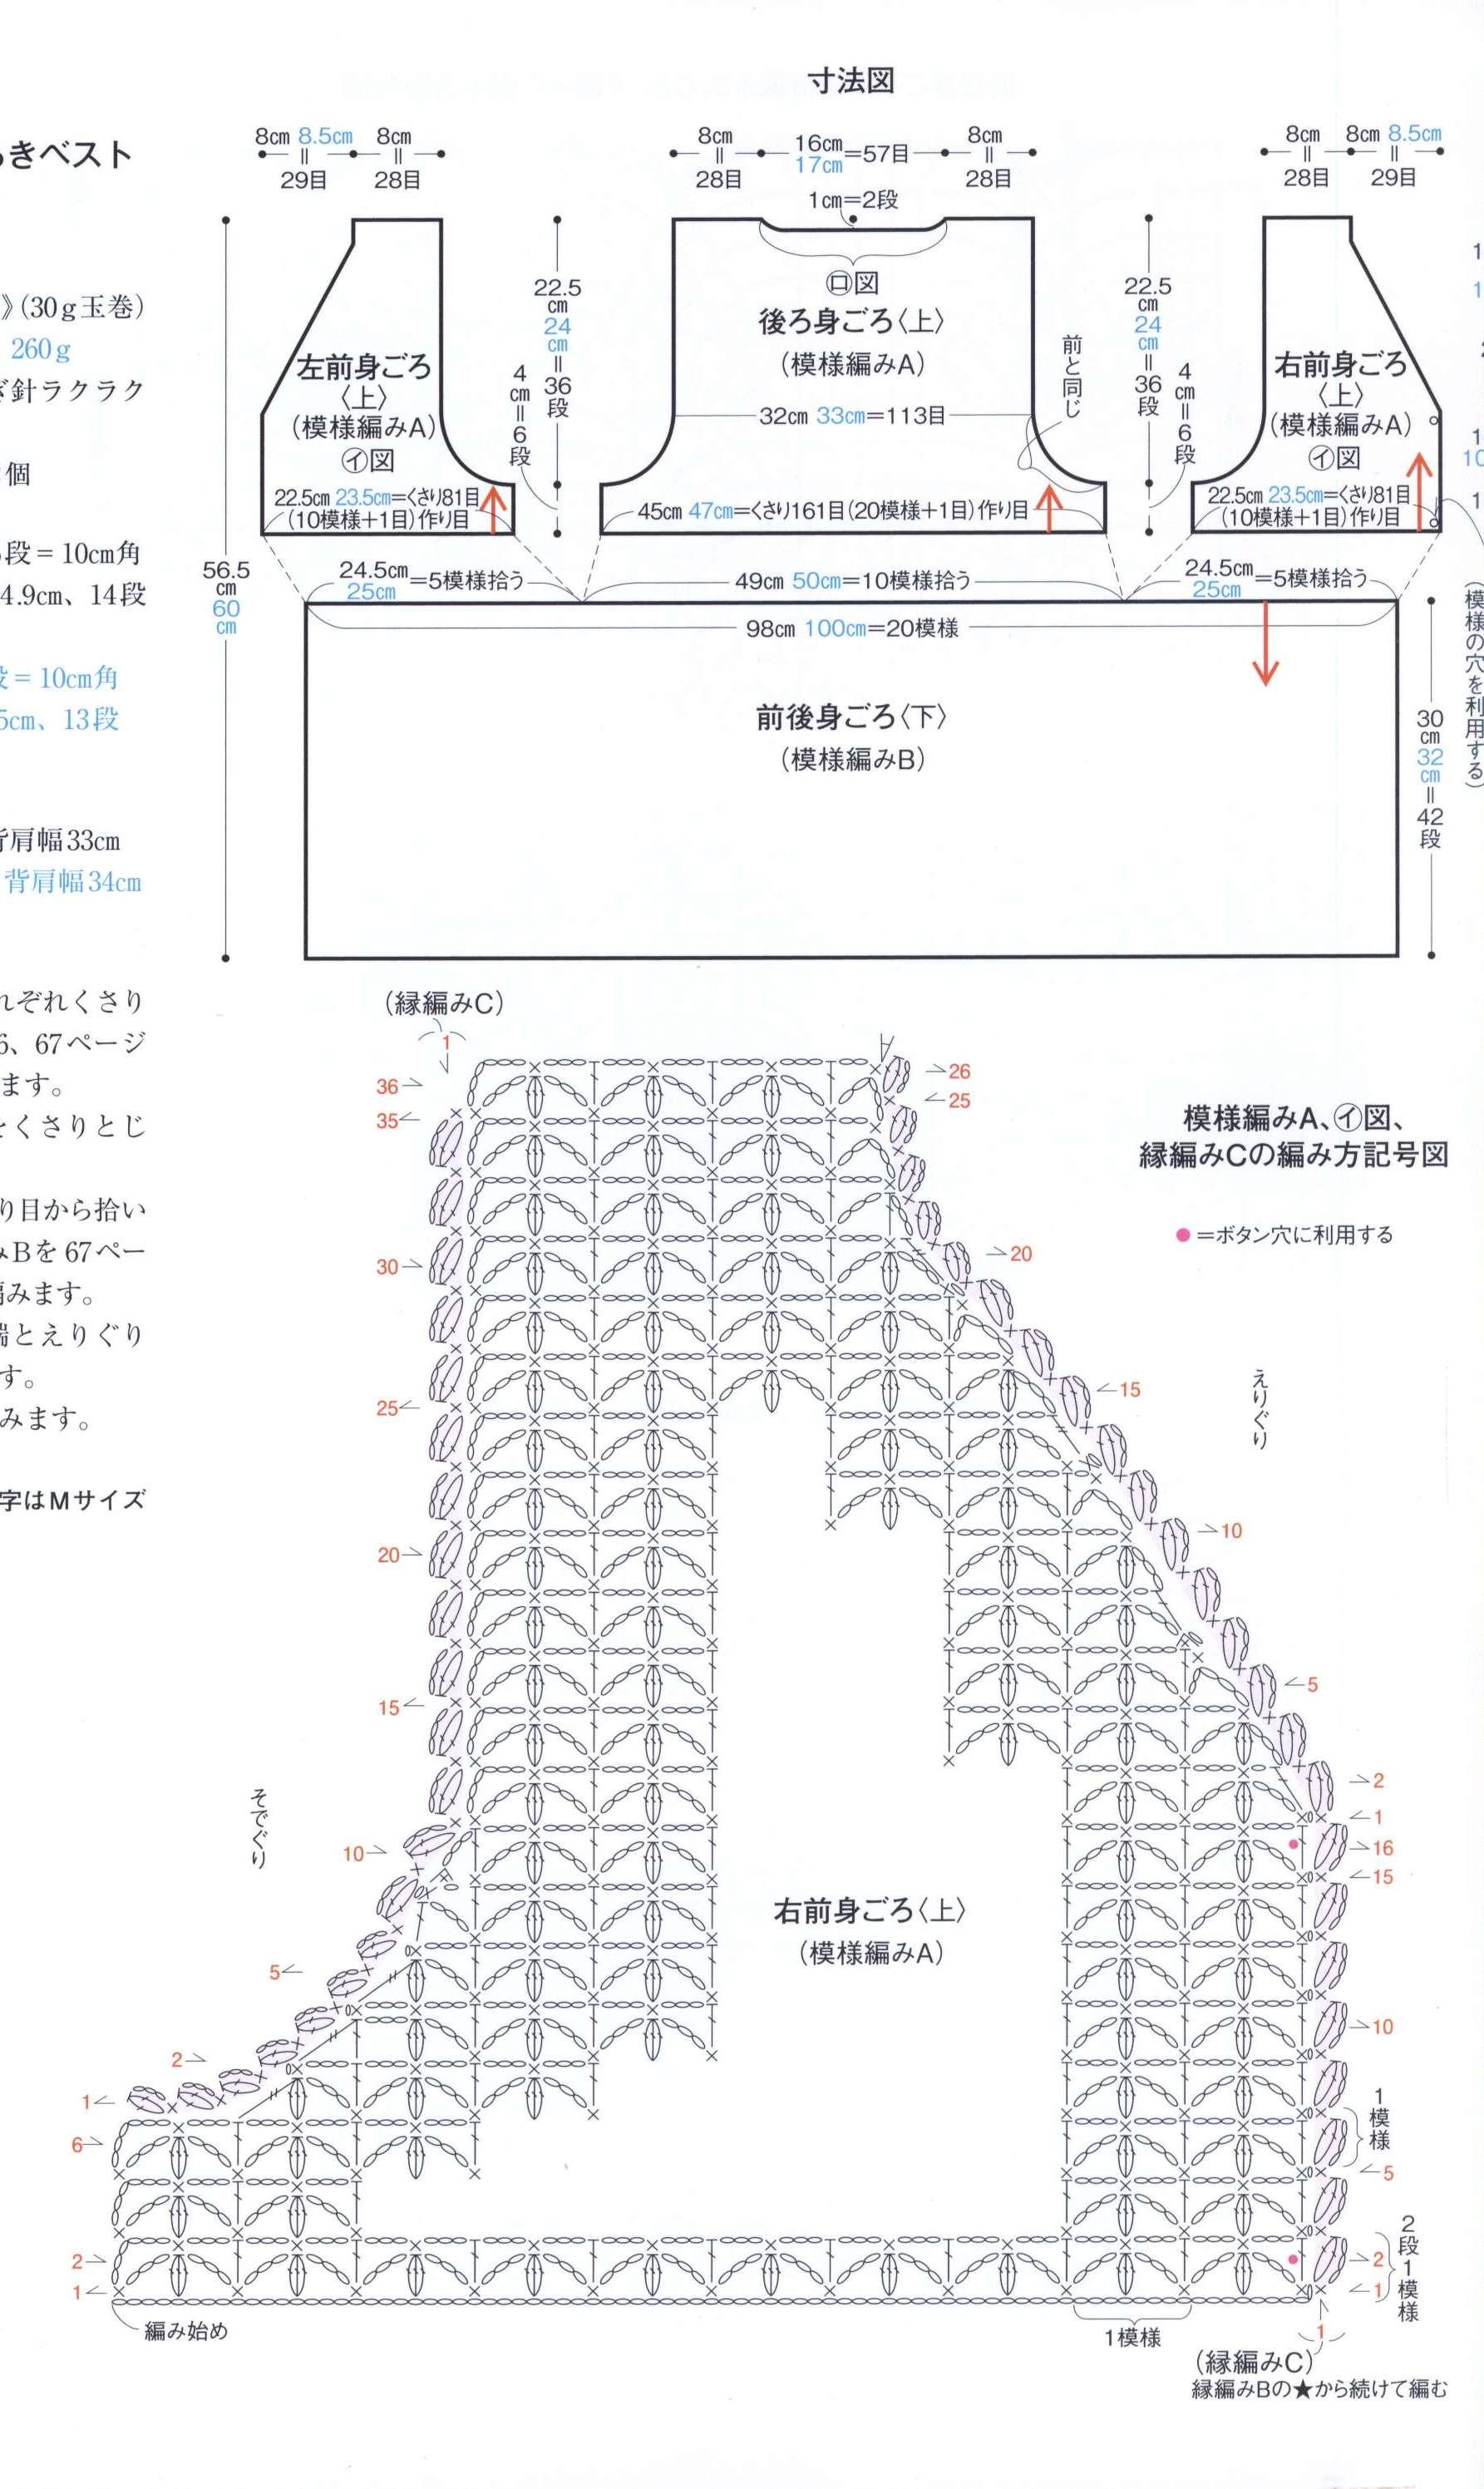 0755_SeibidoMookVol7_14 (23)